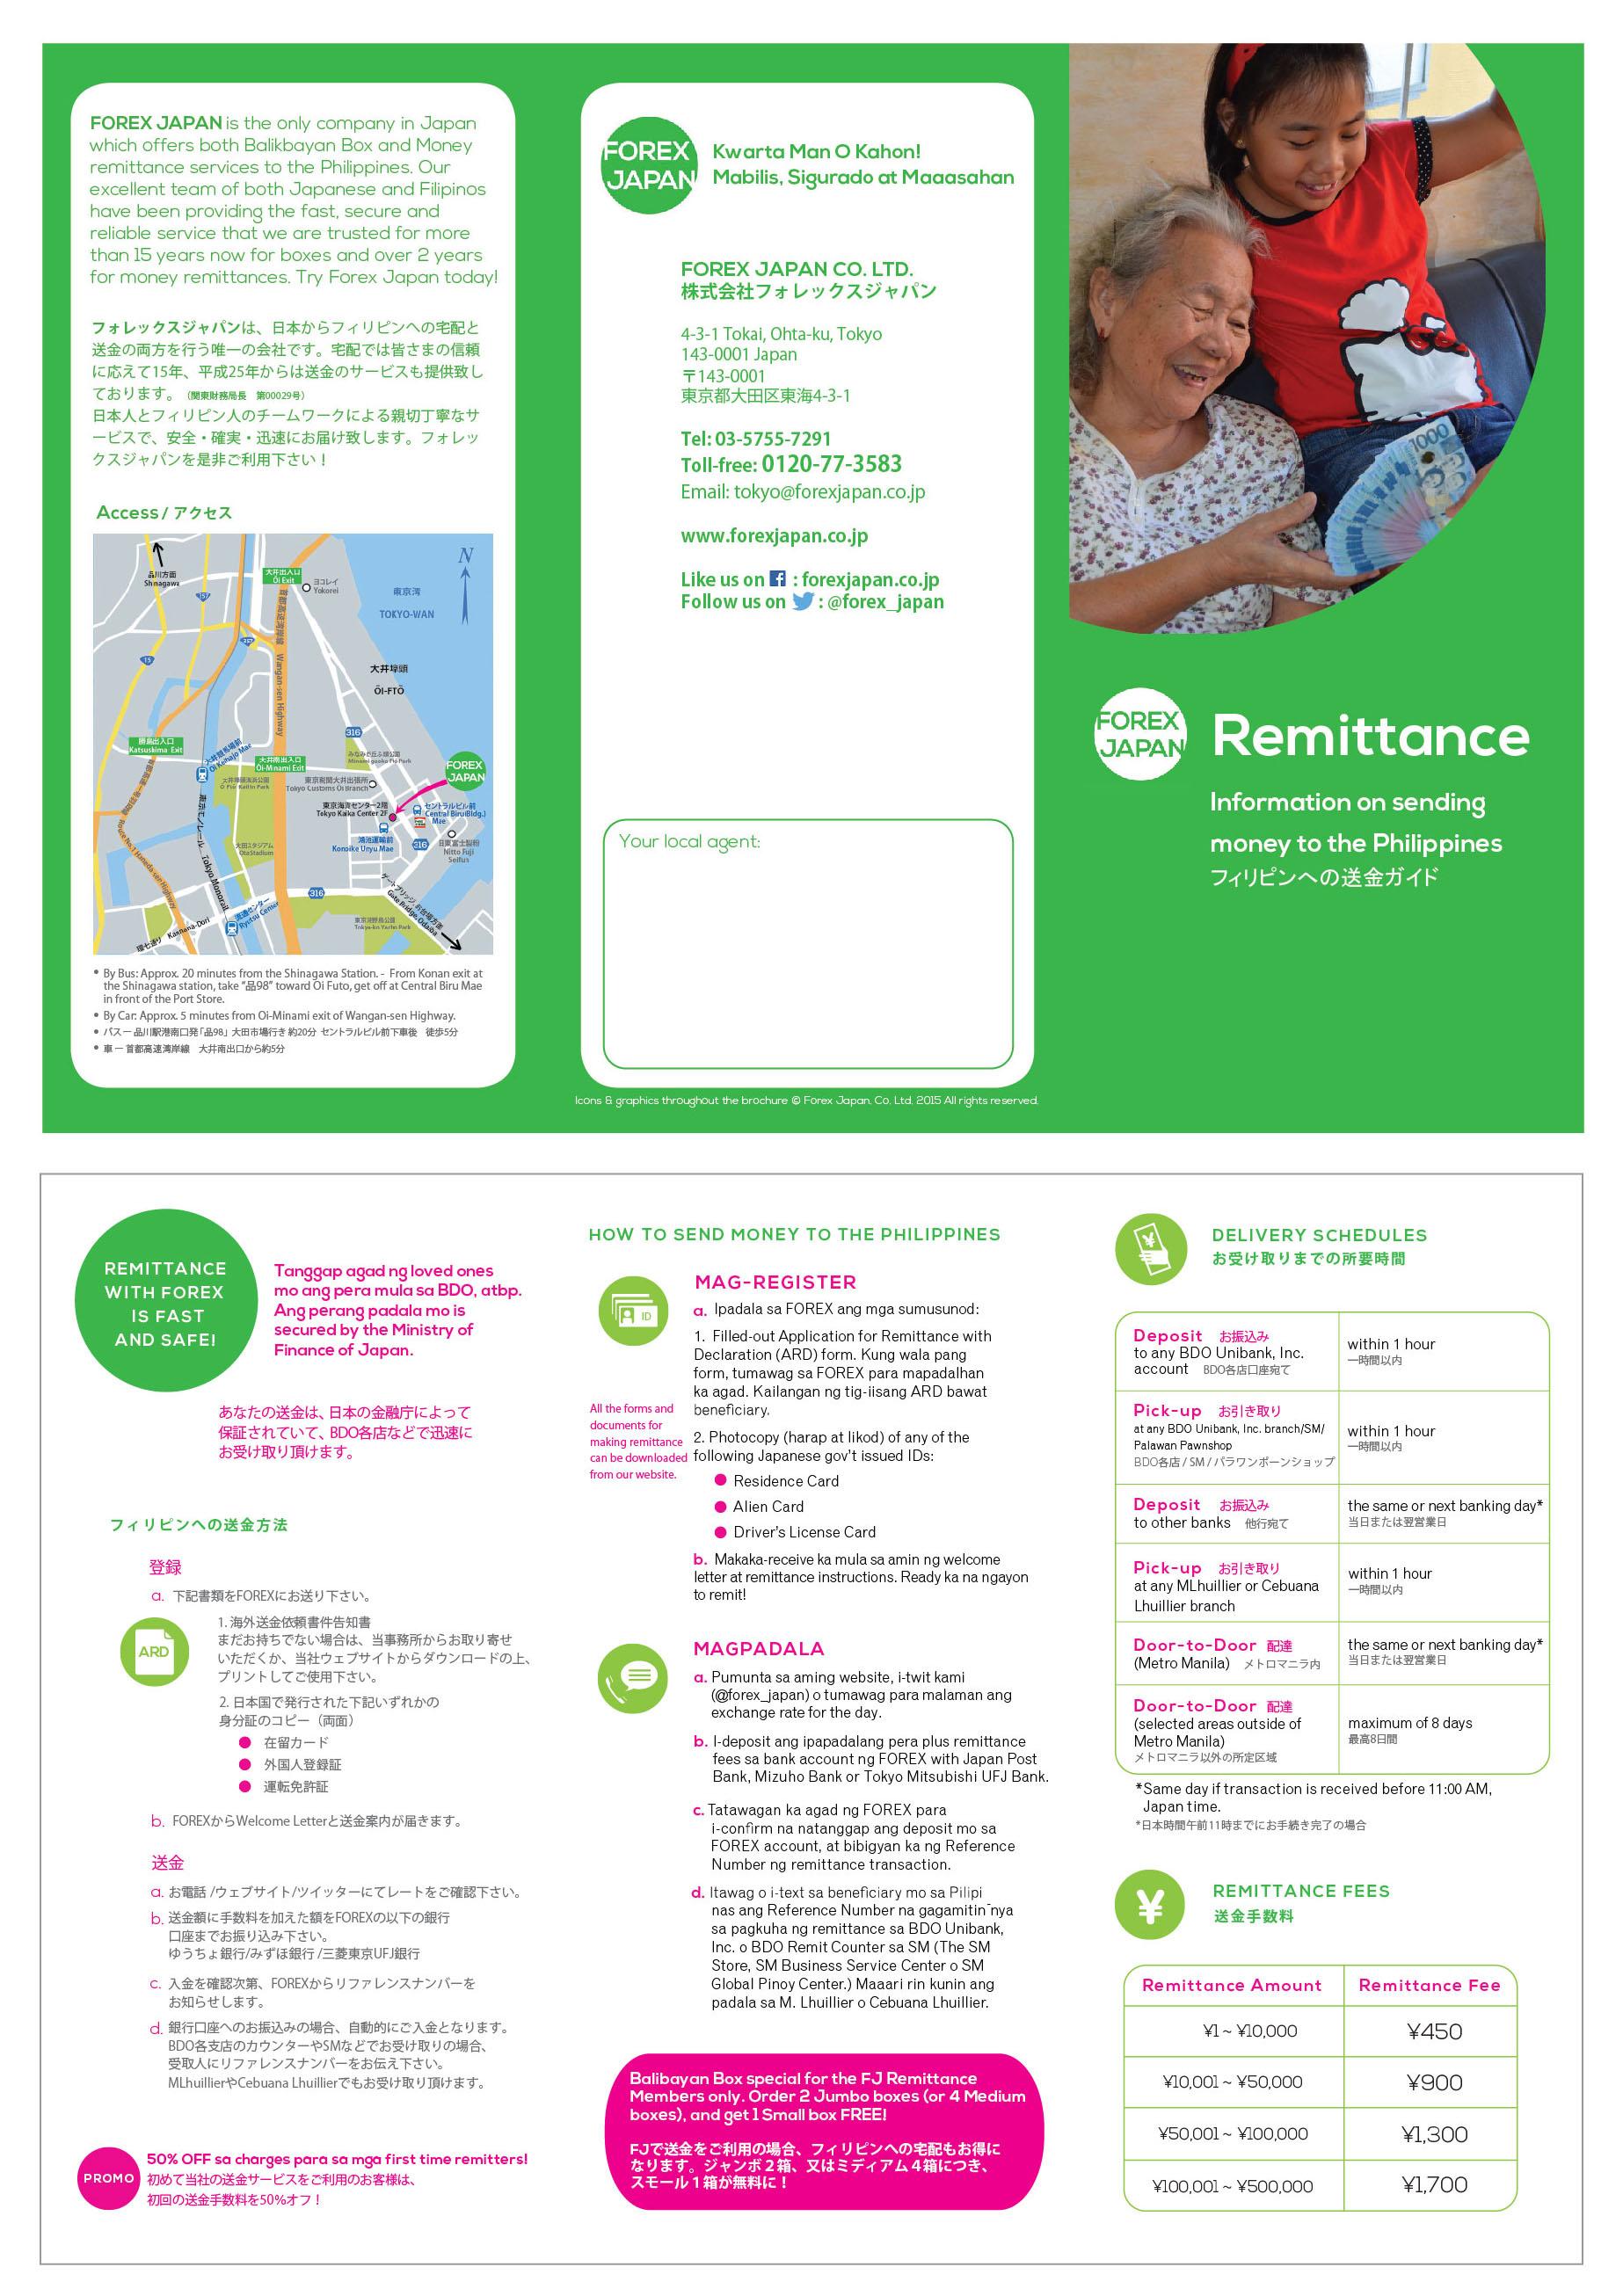 Forex Japan remittance brochure